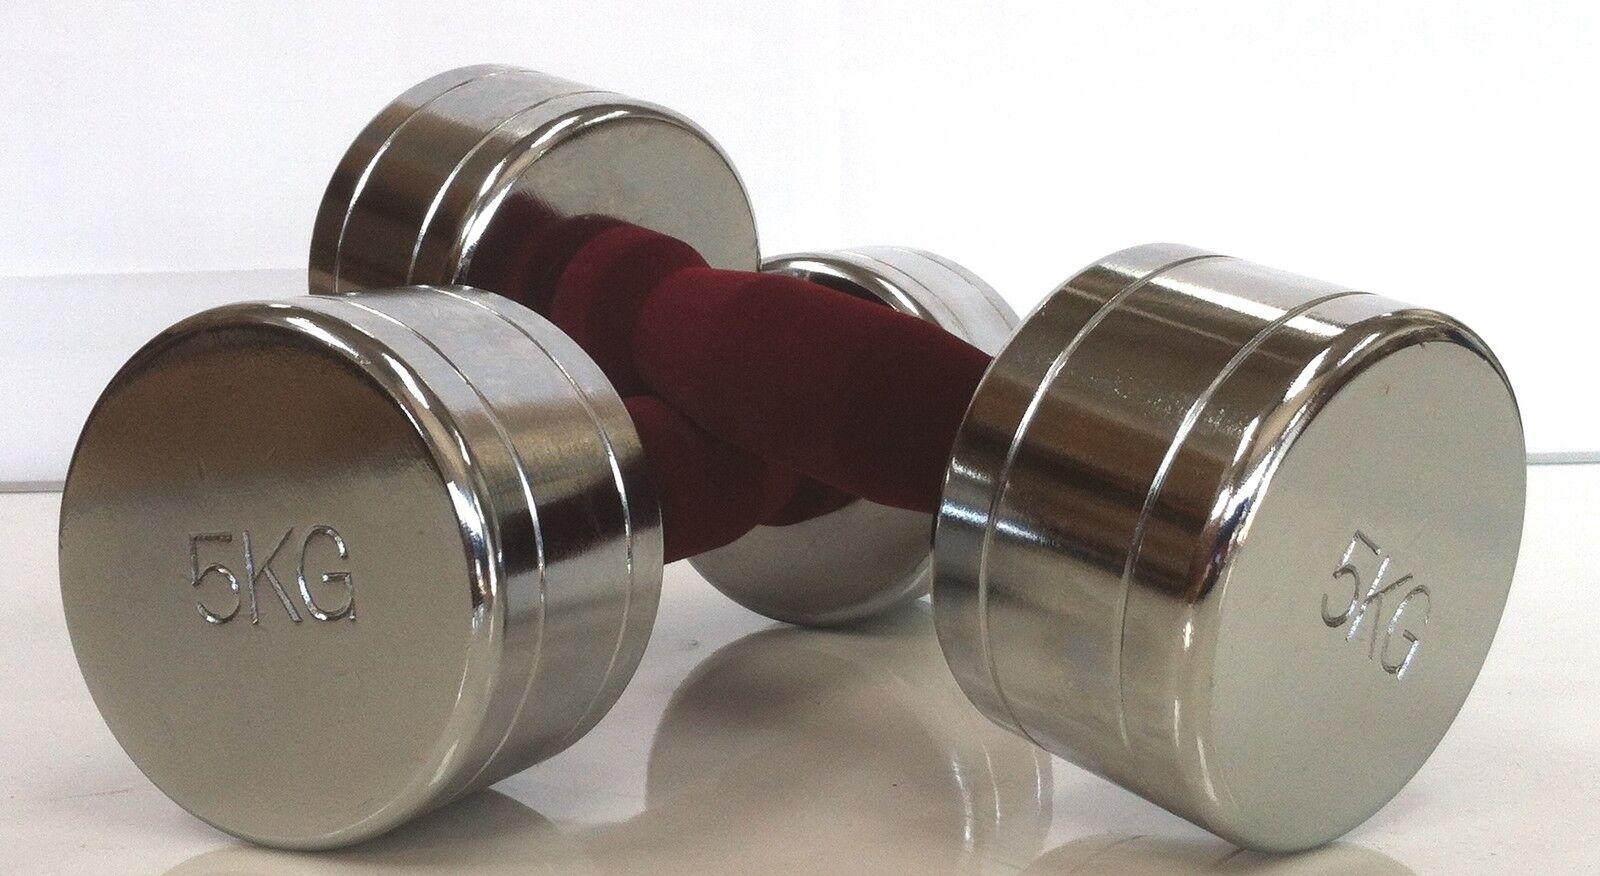 Dumbbells Chrome Dumbbell Pairs 5kg Hand Weights Dumbells 2kg + 5kg Pairs e80870